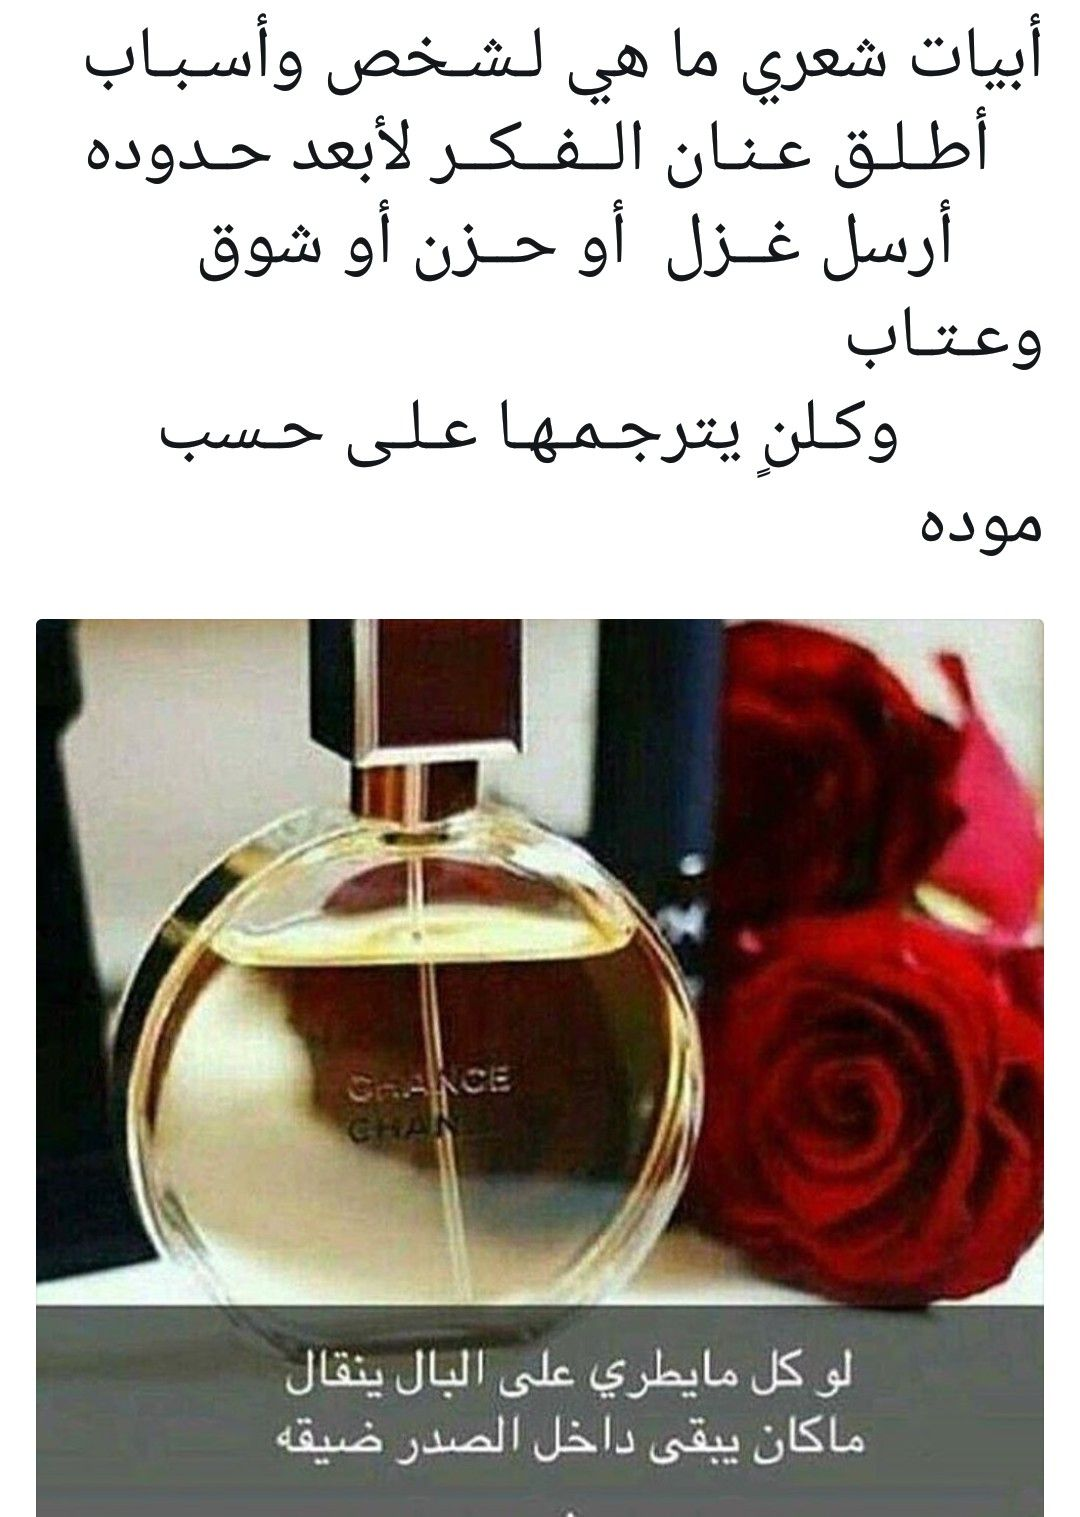 Pin By Najd On خواطر وشعر Perfume Bottles Perfume Bottle